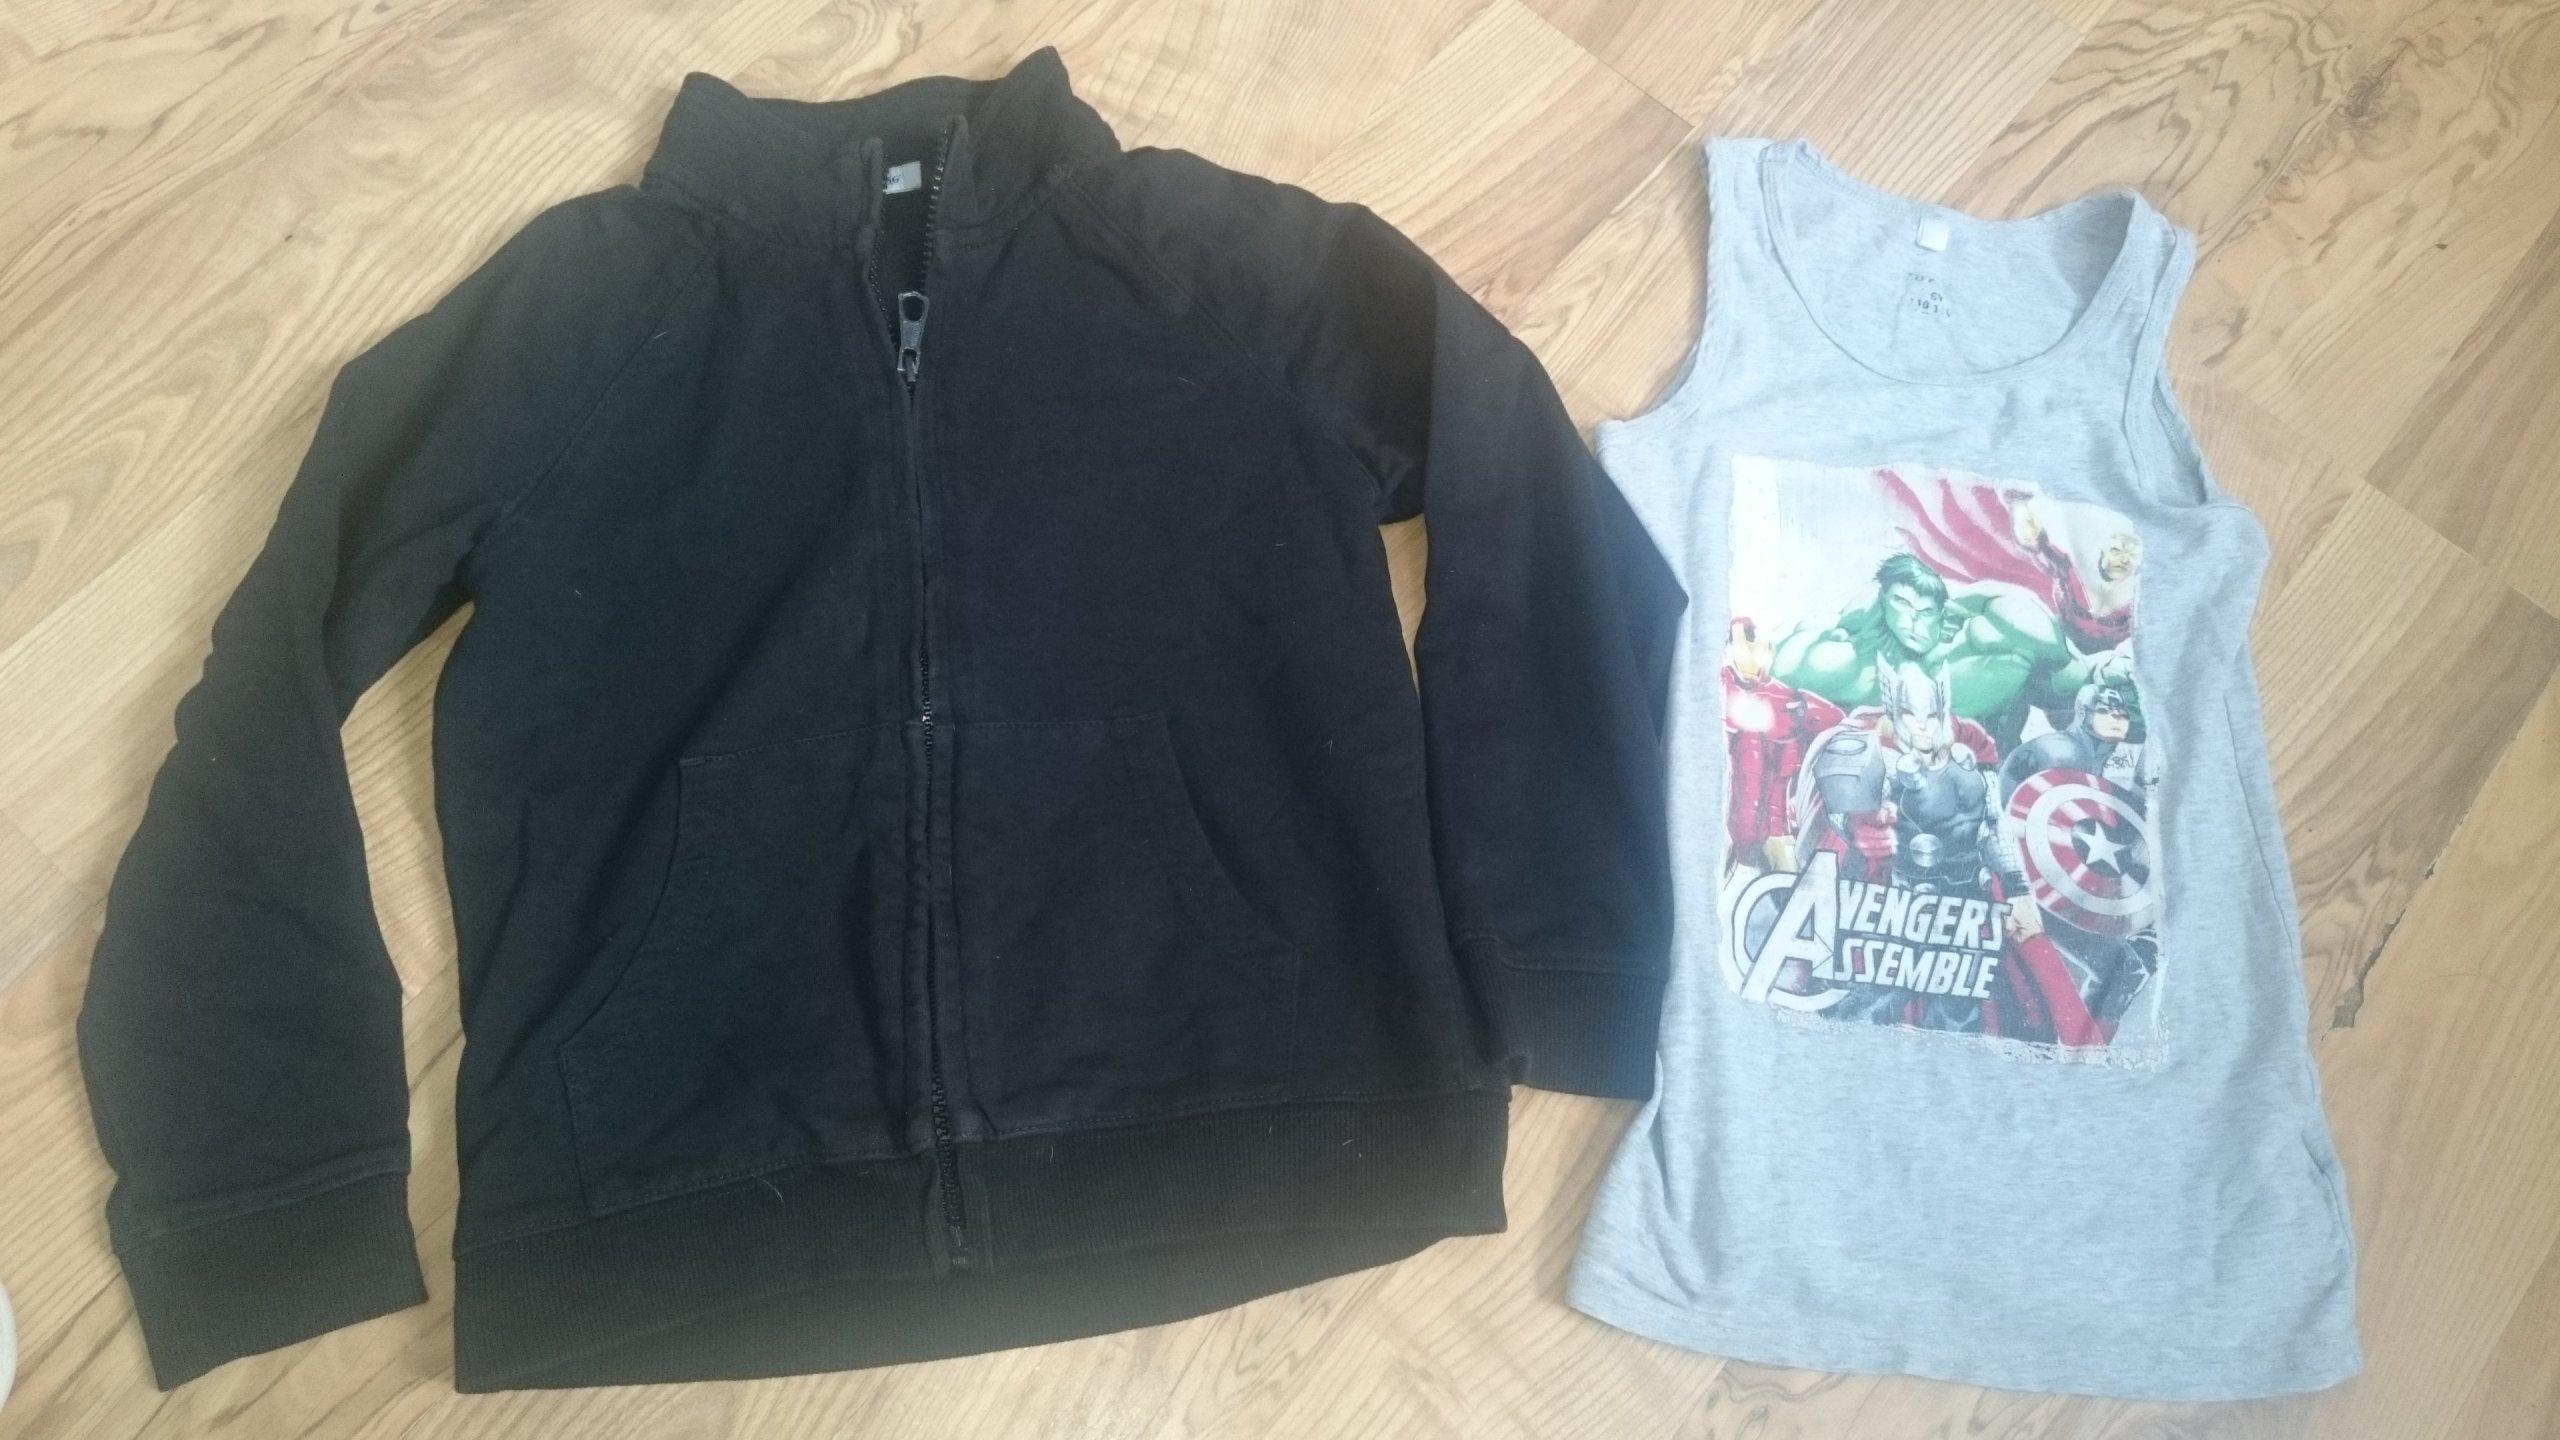 d38fc10736 Bluza na suwak 110-116 George +koszula Marvel - 7240398631 ...